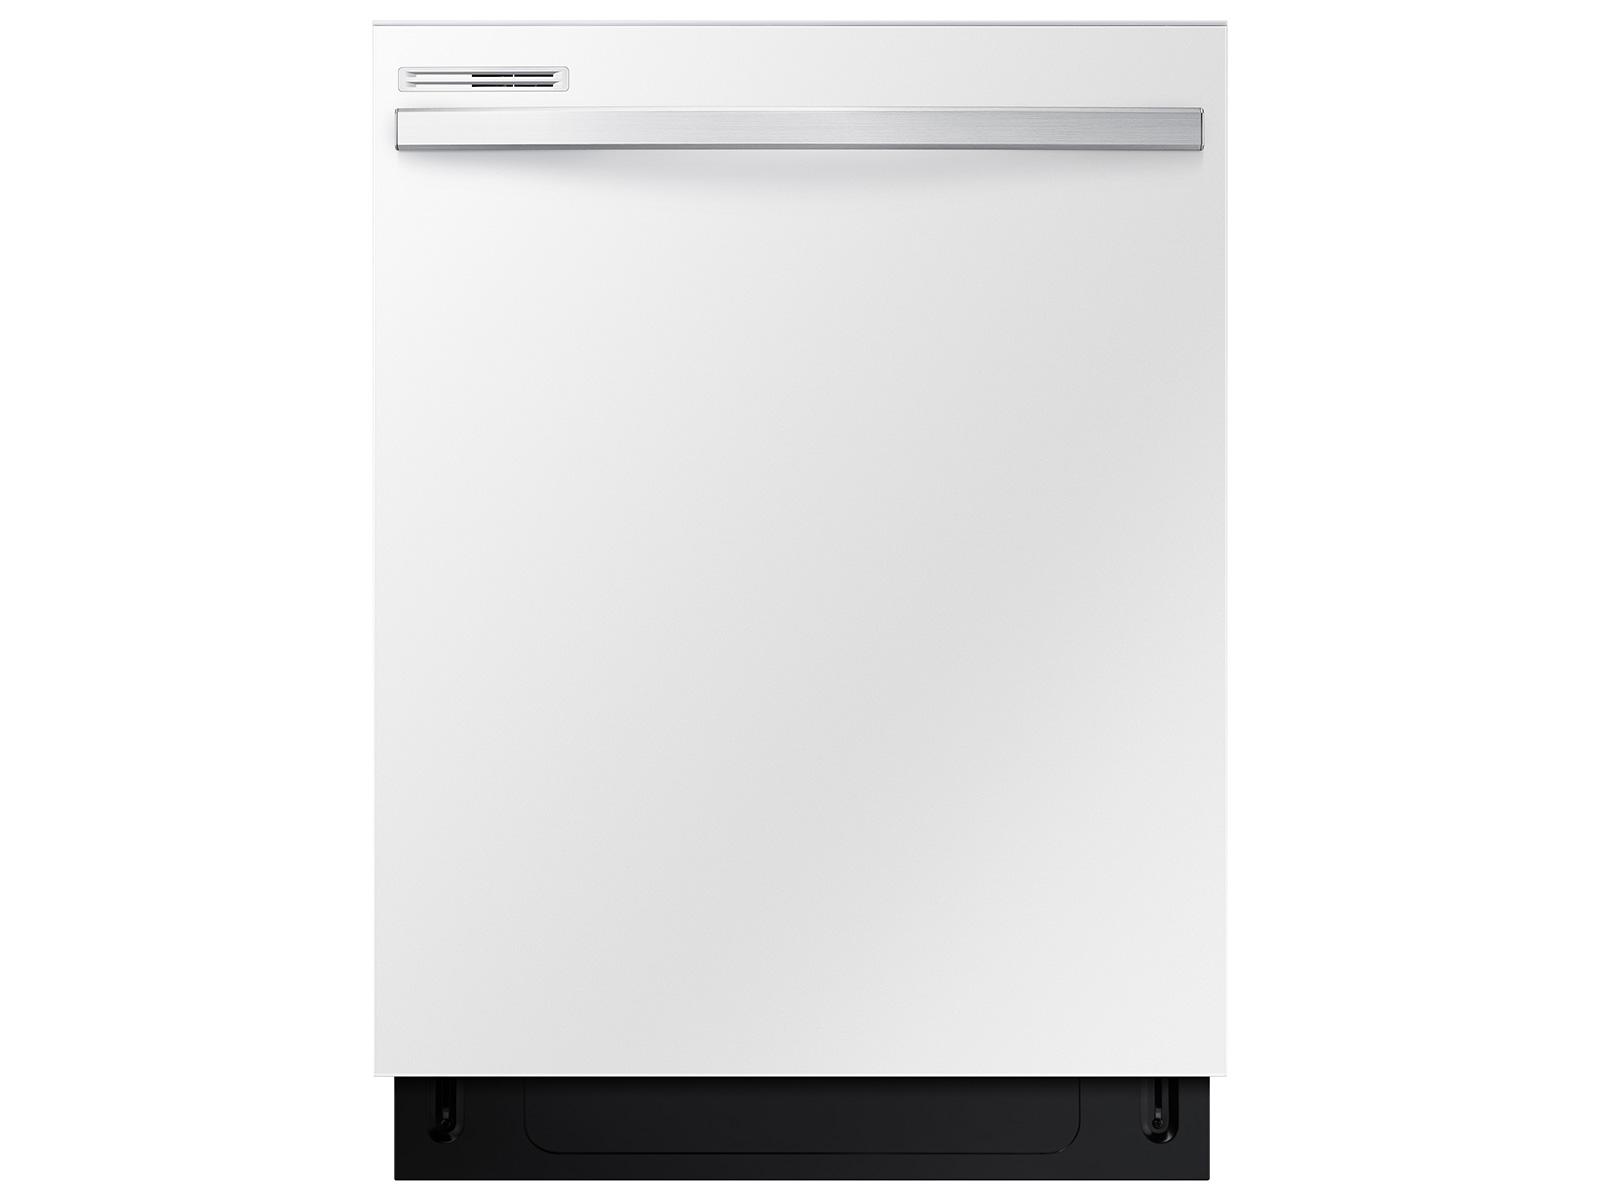 Digital Touch Control 55 dBA Dishwasher in White